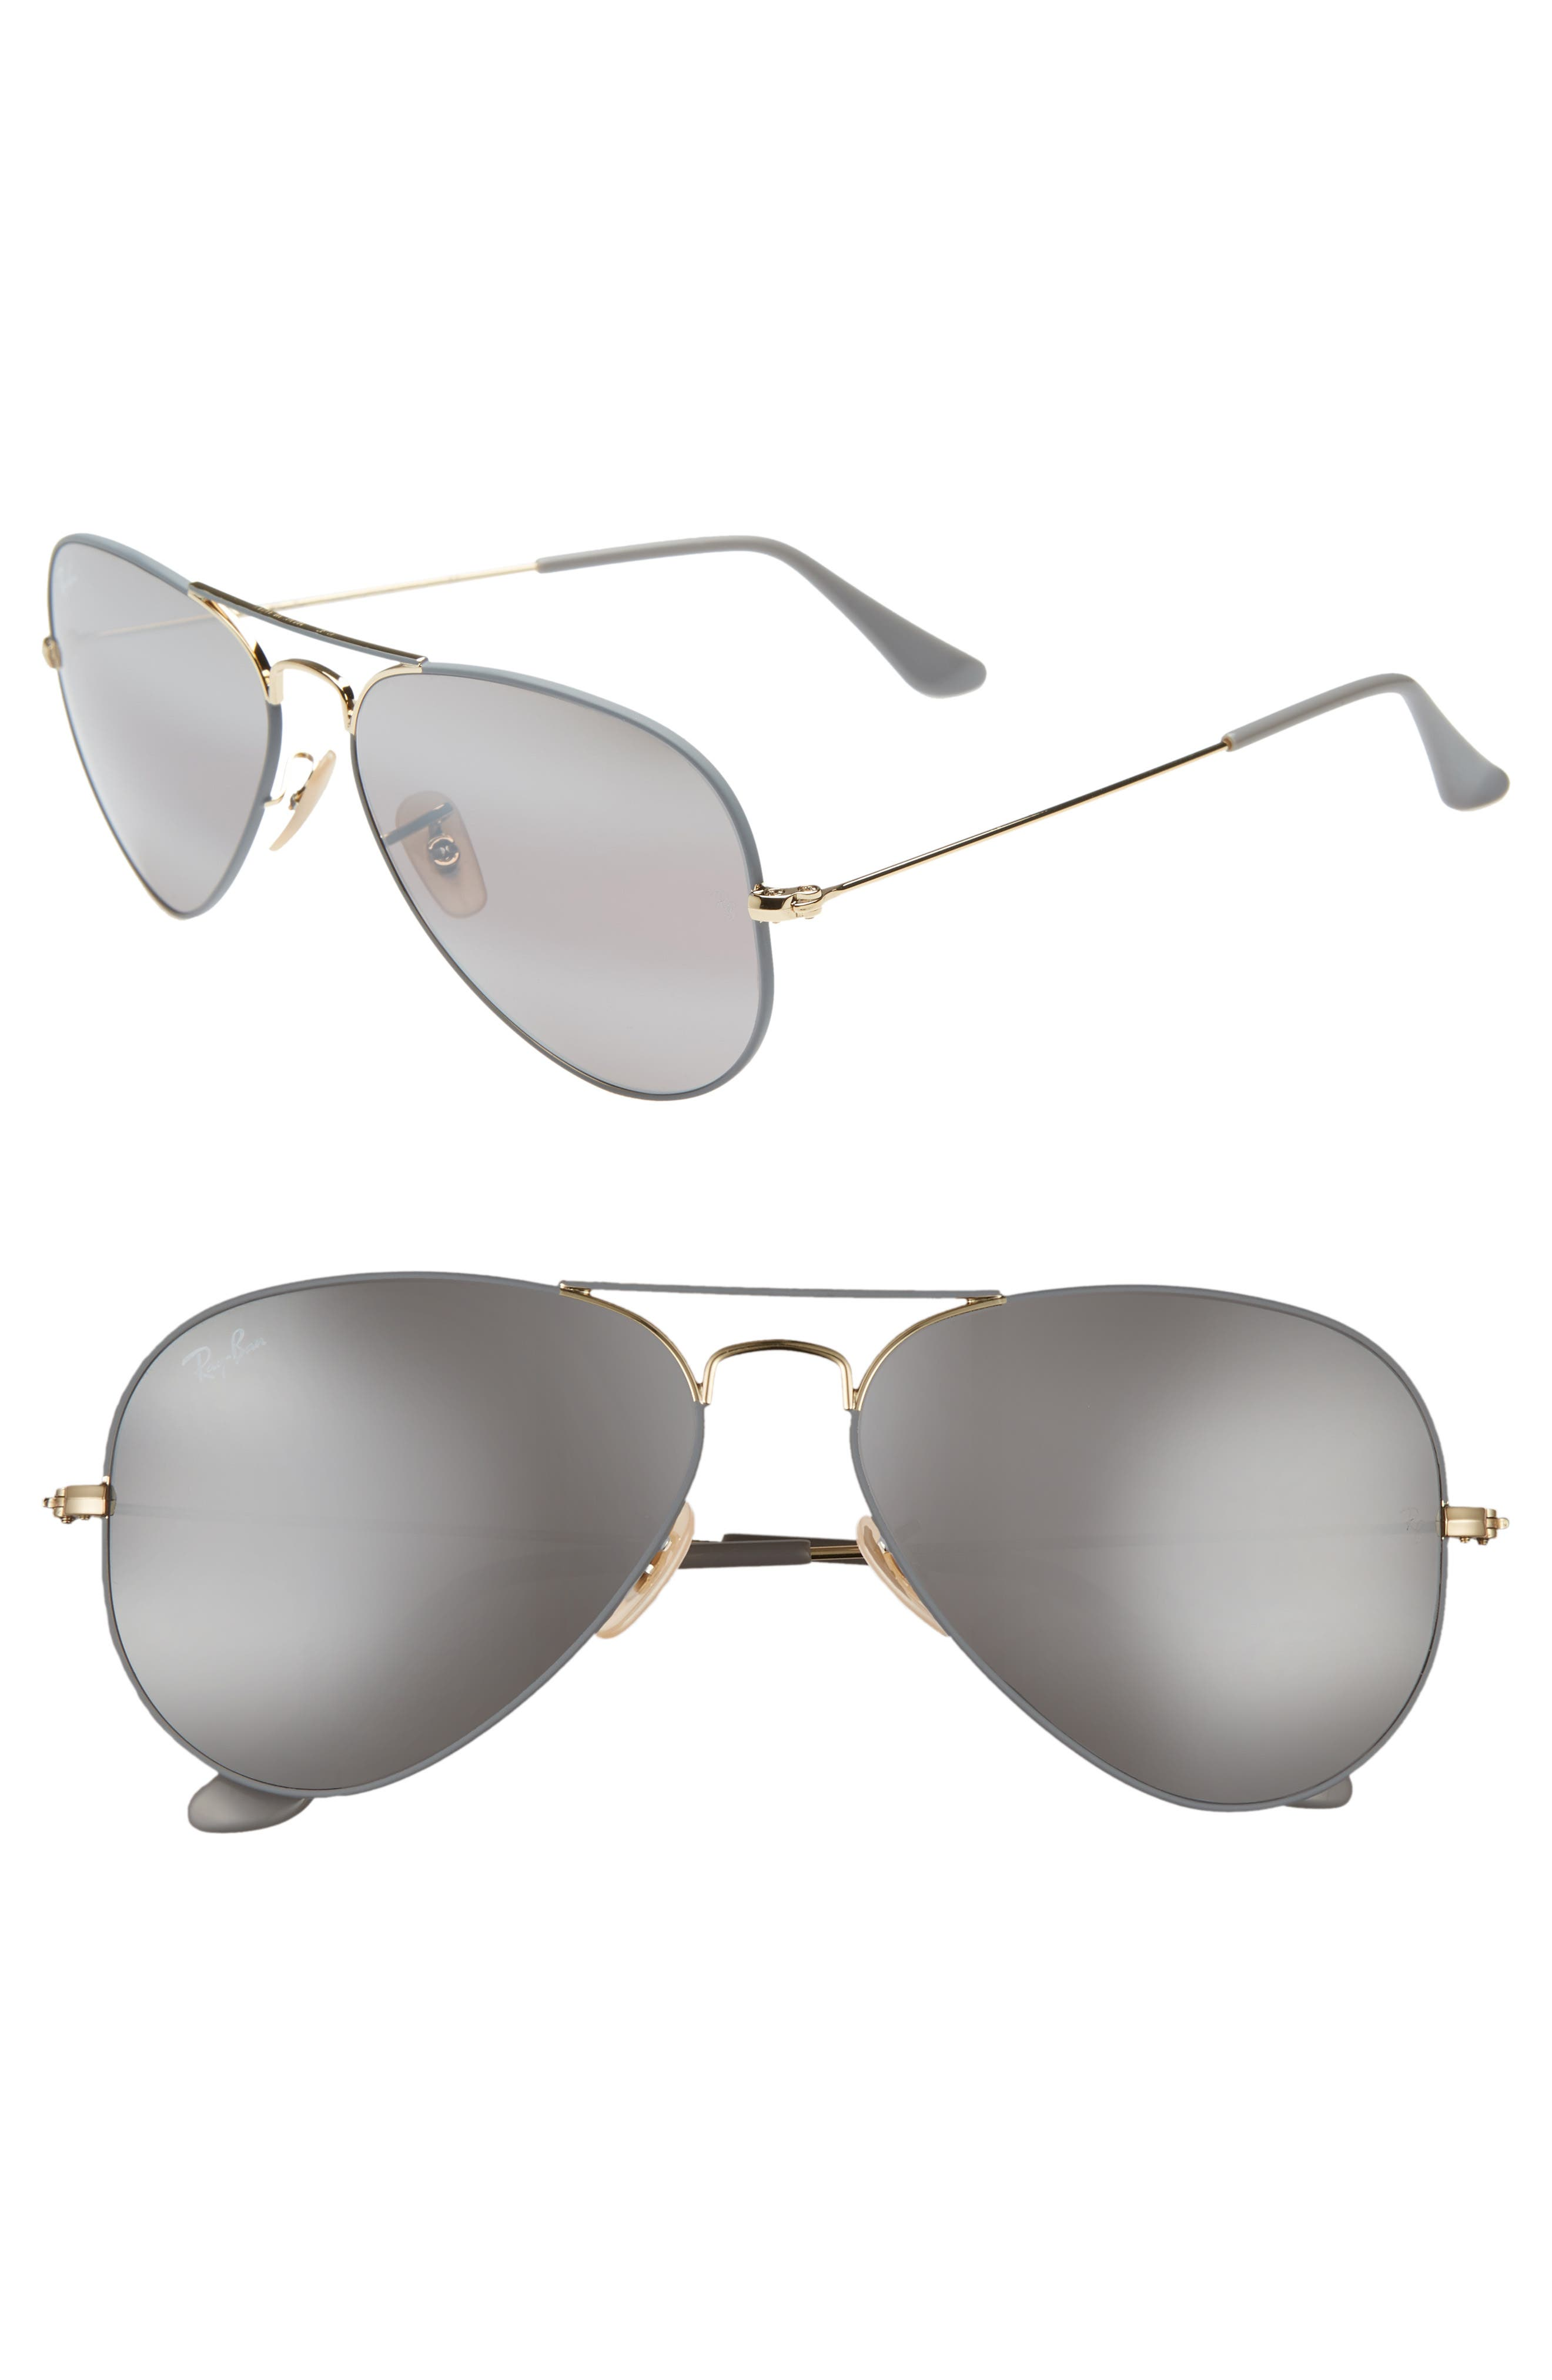 Ray-Ban Original Aviator 5m Sunglasses - Gold Grey